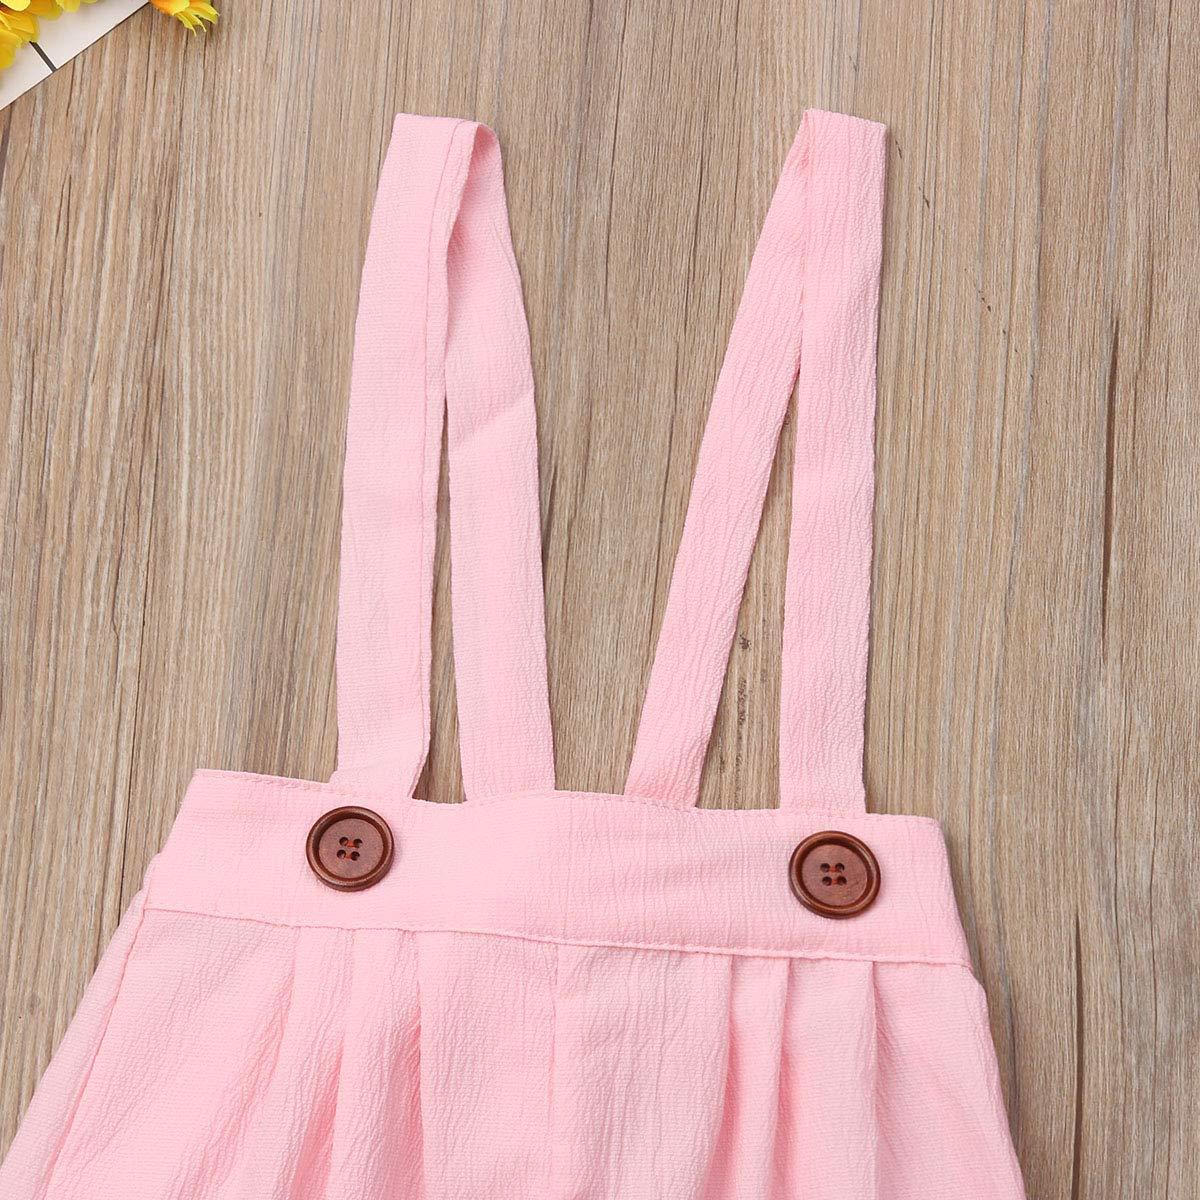 Mubineo Kids Toddler Girl Basic Plain Adjustable Straps Chiffon Wide Leg Suspender Pants